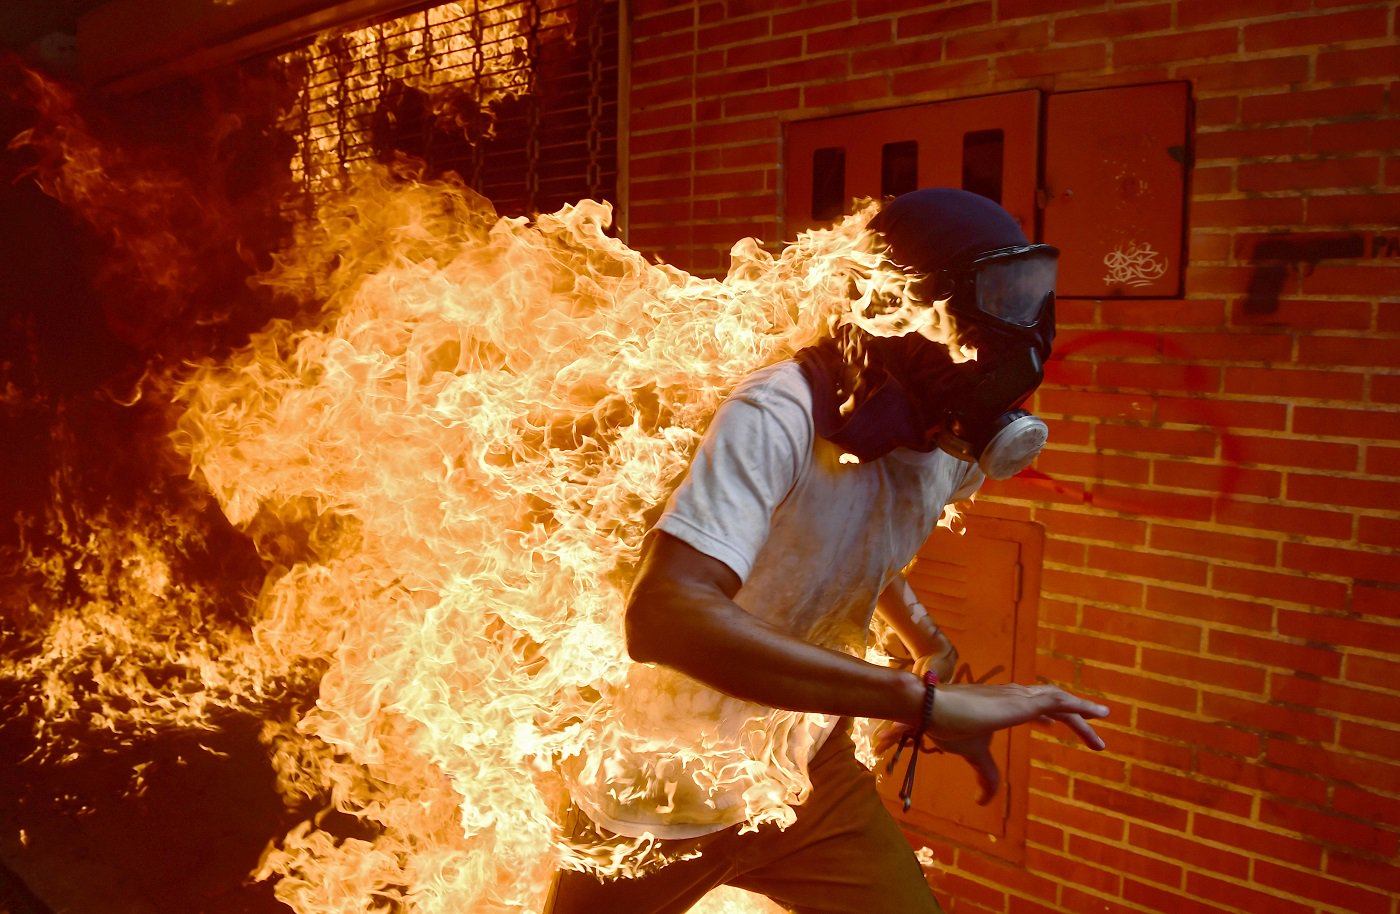 protestas-venezuela-Ronaldo-Schemidt-nominada-world-press-photo